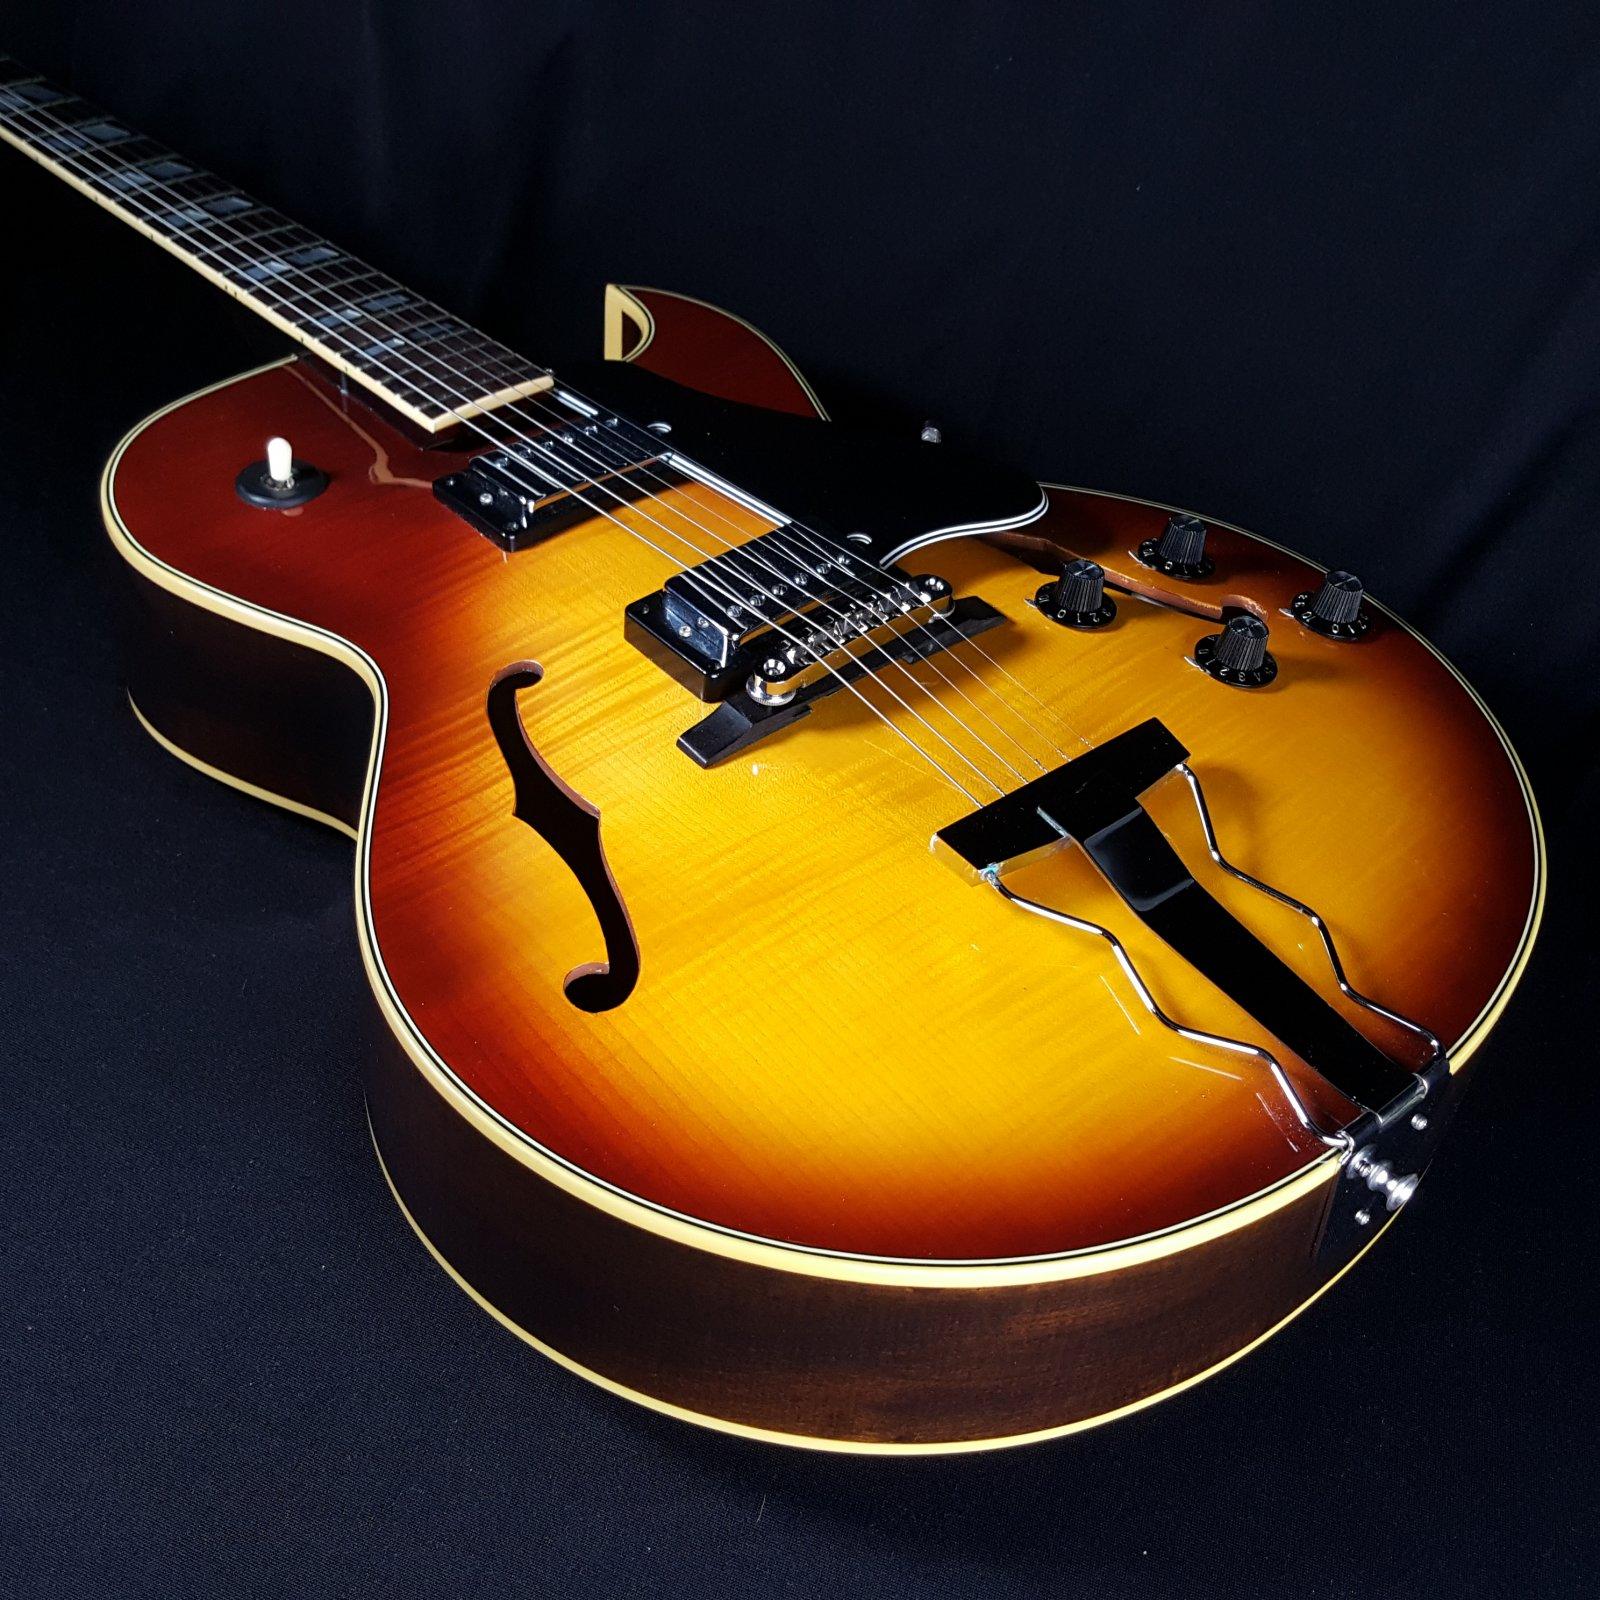 Used Ibanez 2355 Lawsuit 1977 Guitar Sunburst with OHSC